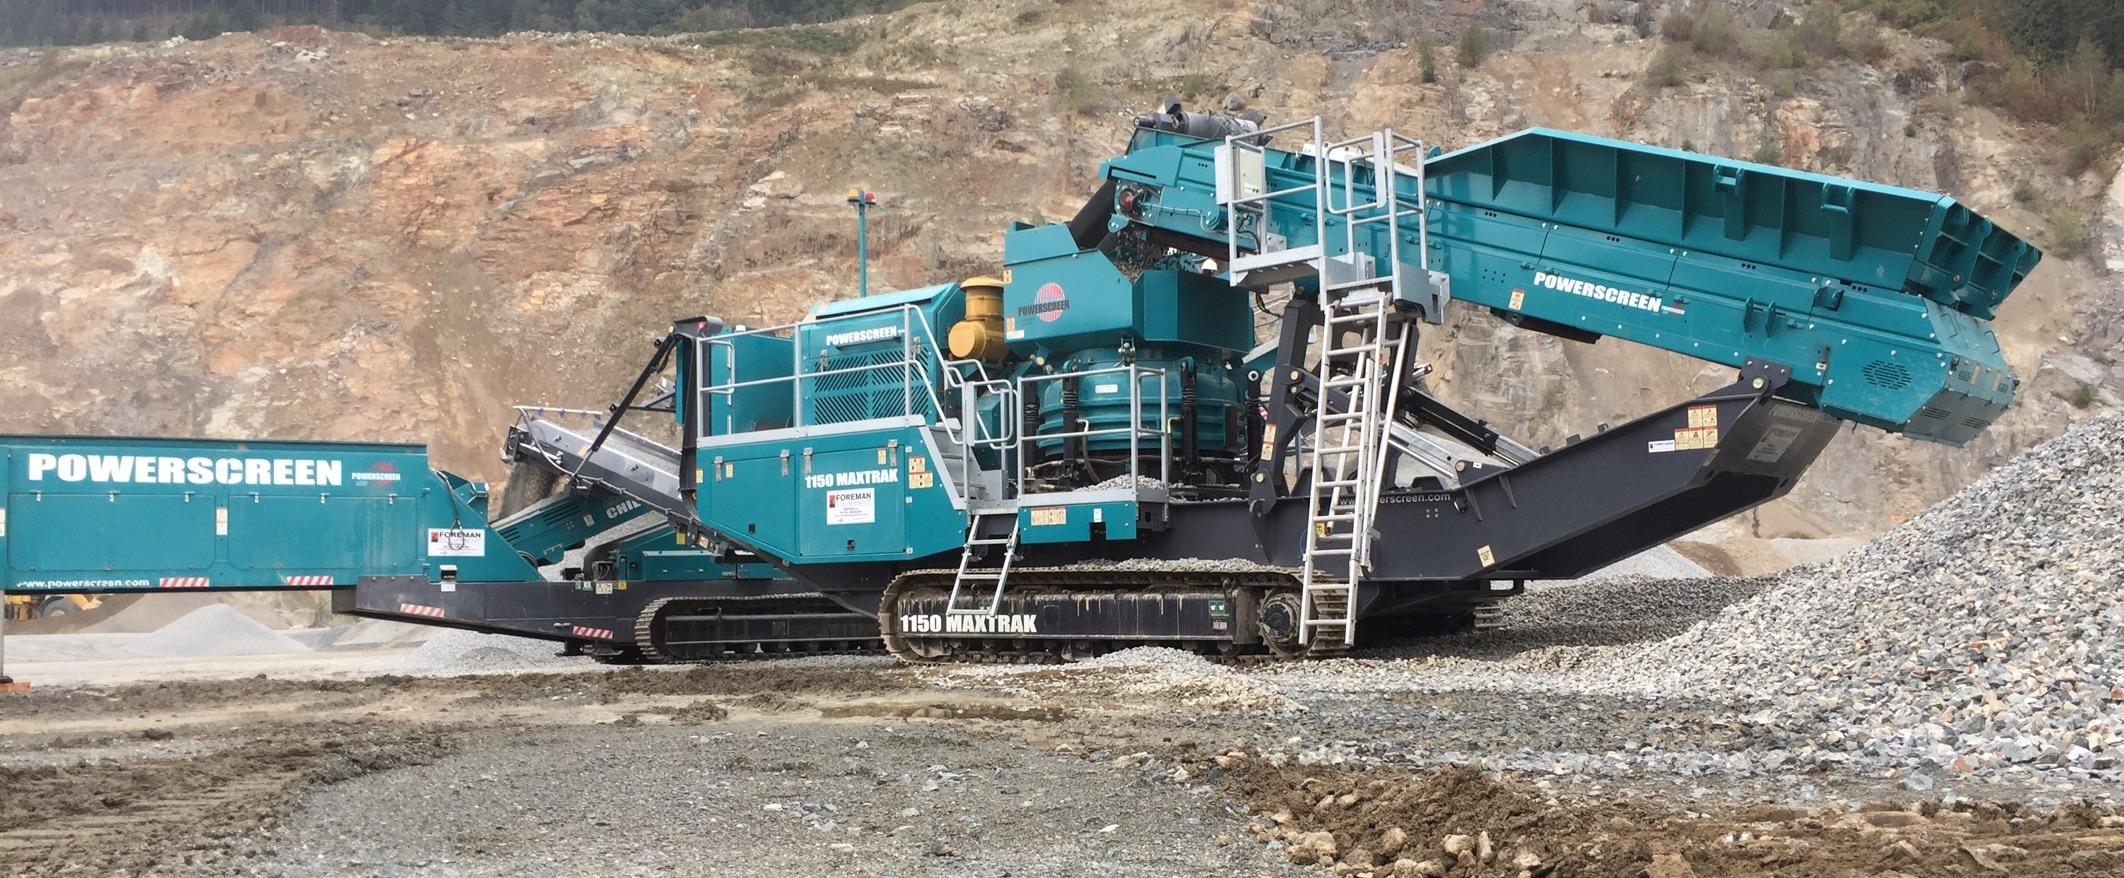 Powerscreen Crushing Equipment Sales & Rental in BC & Alberta